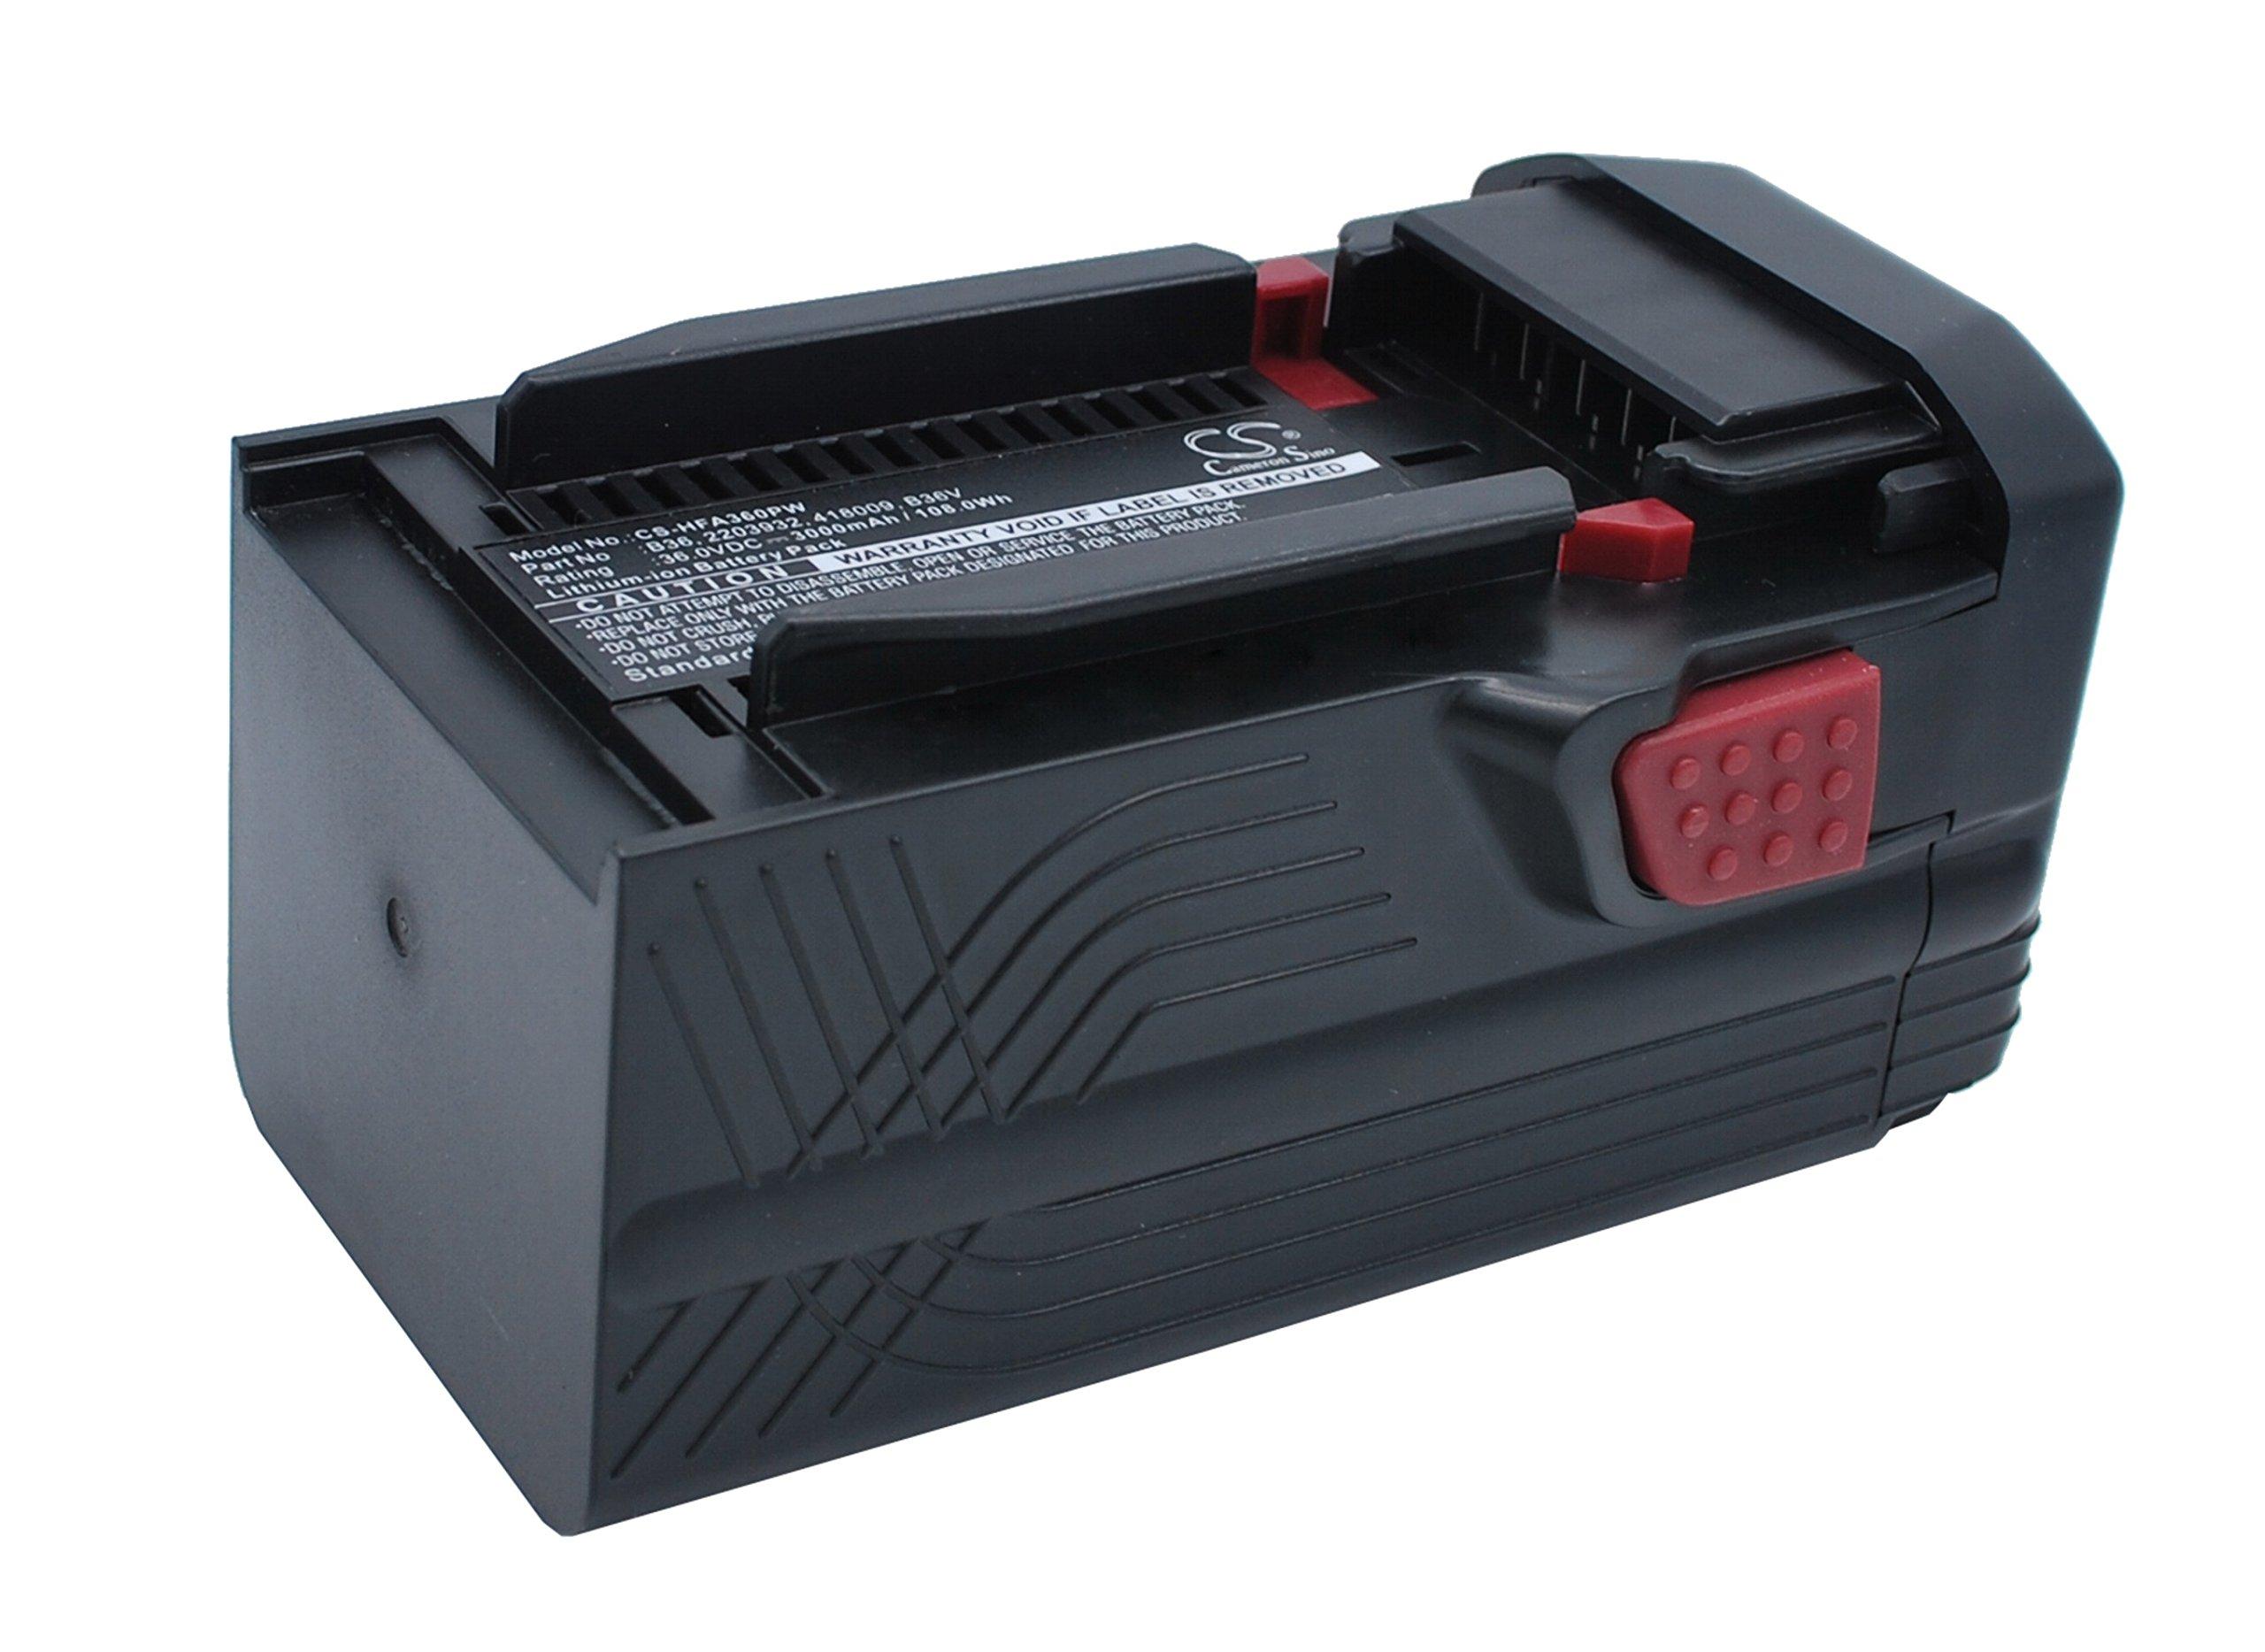 Pearanett 3000mAh / 108.0Wh Battery Compatible With HILTI TE6-A36, TE6-A Li, WSR36-A by Pearanett